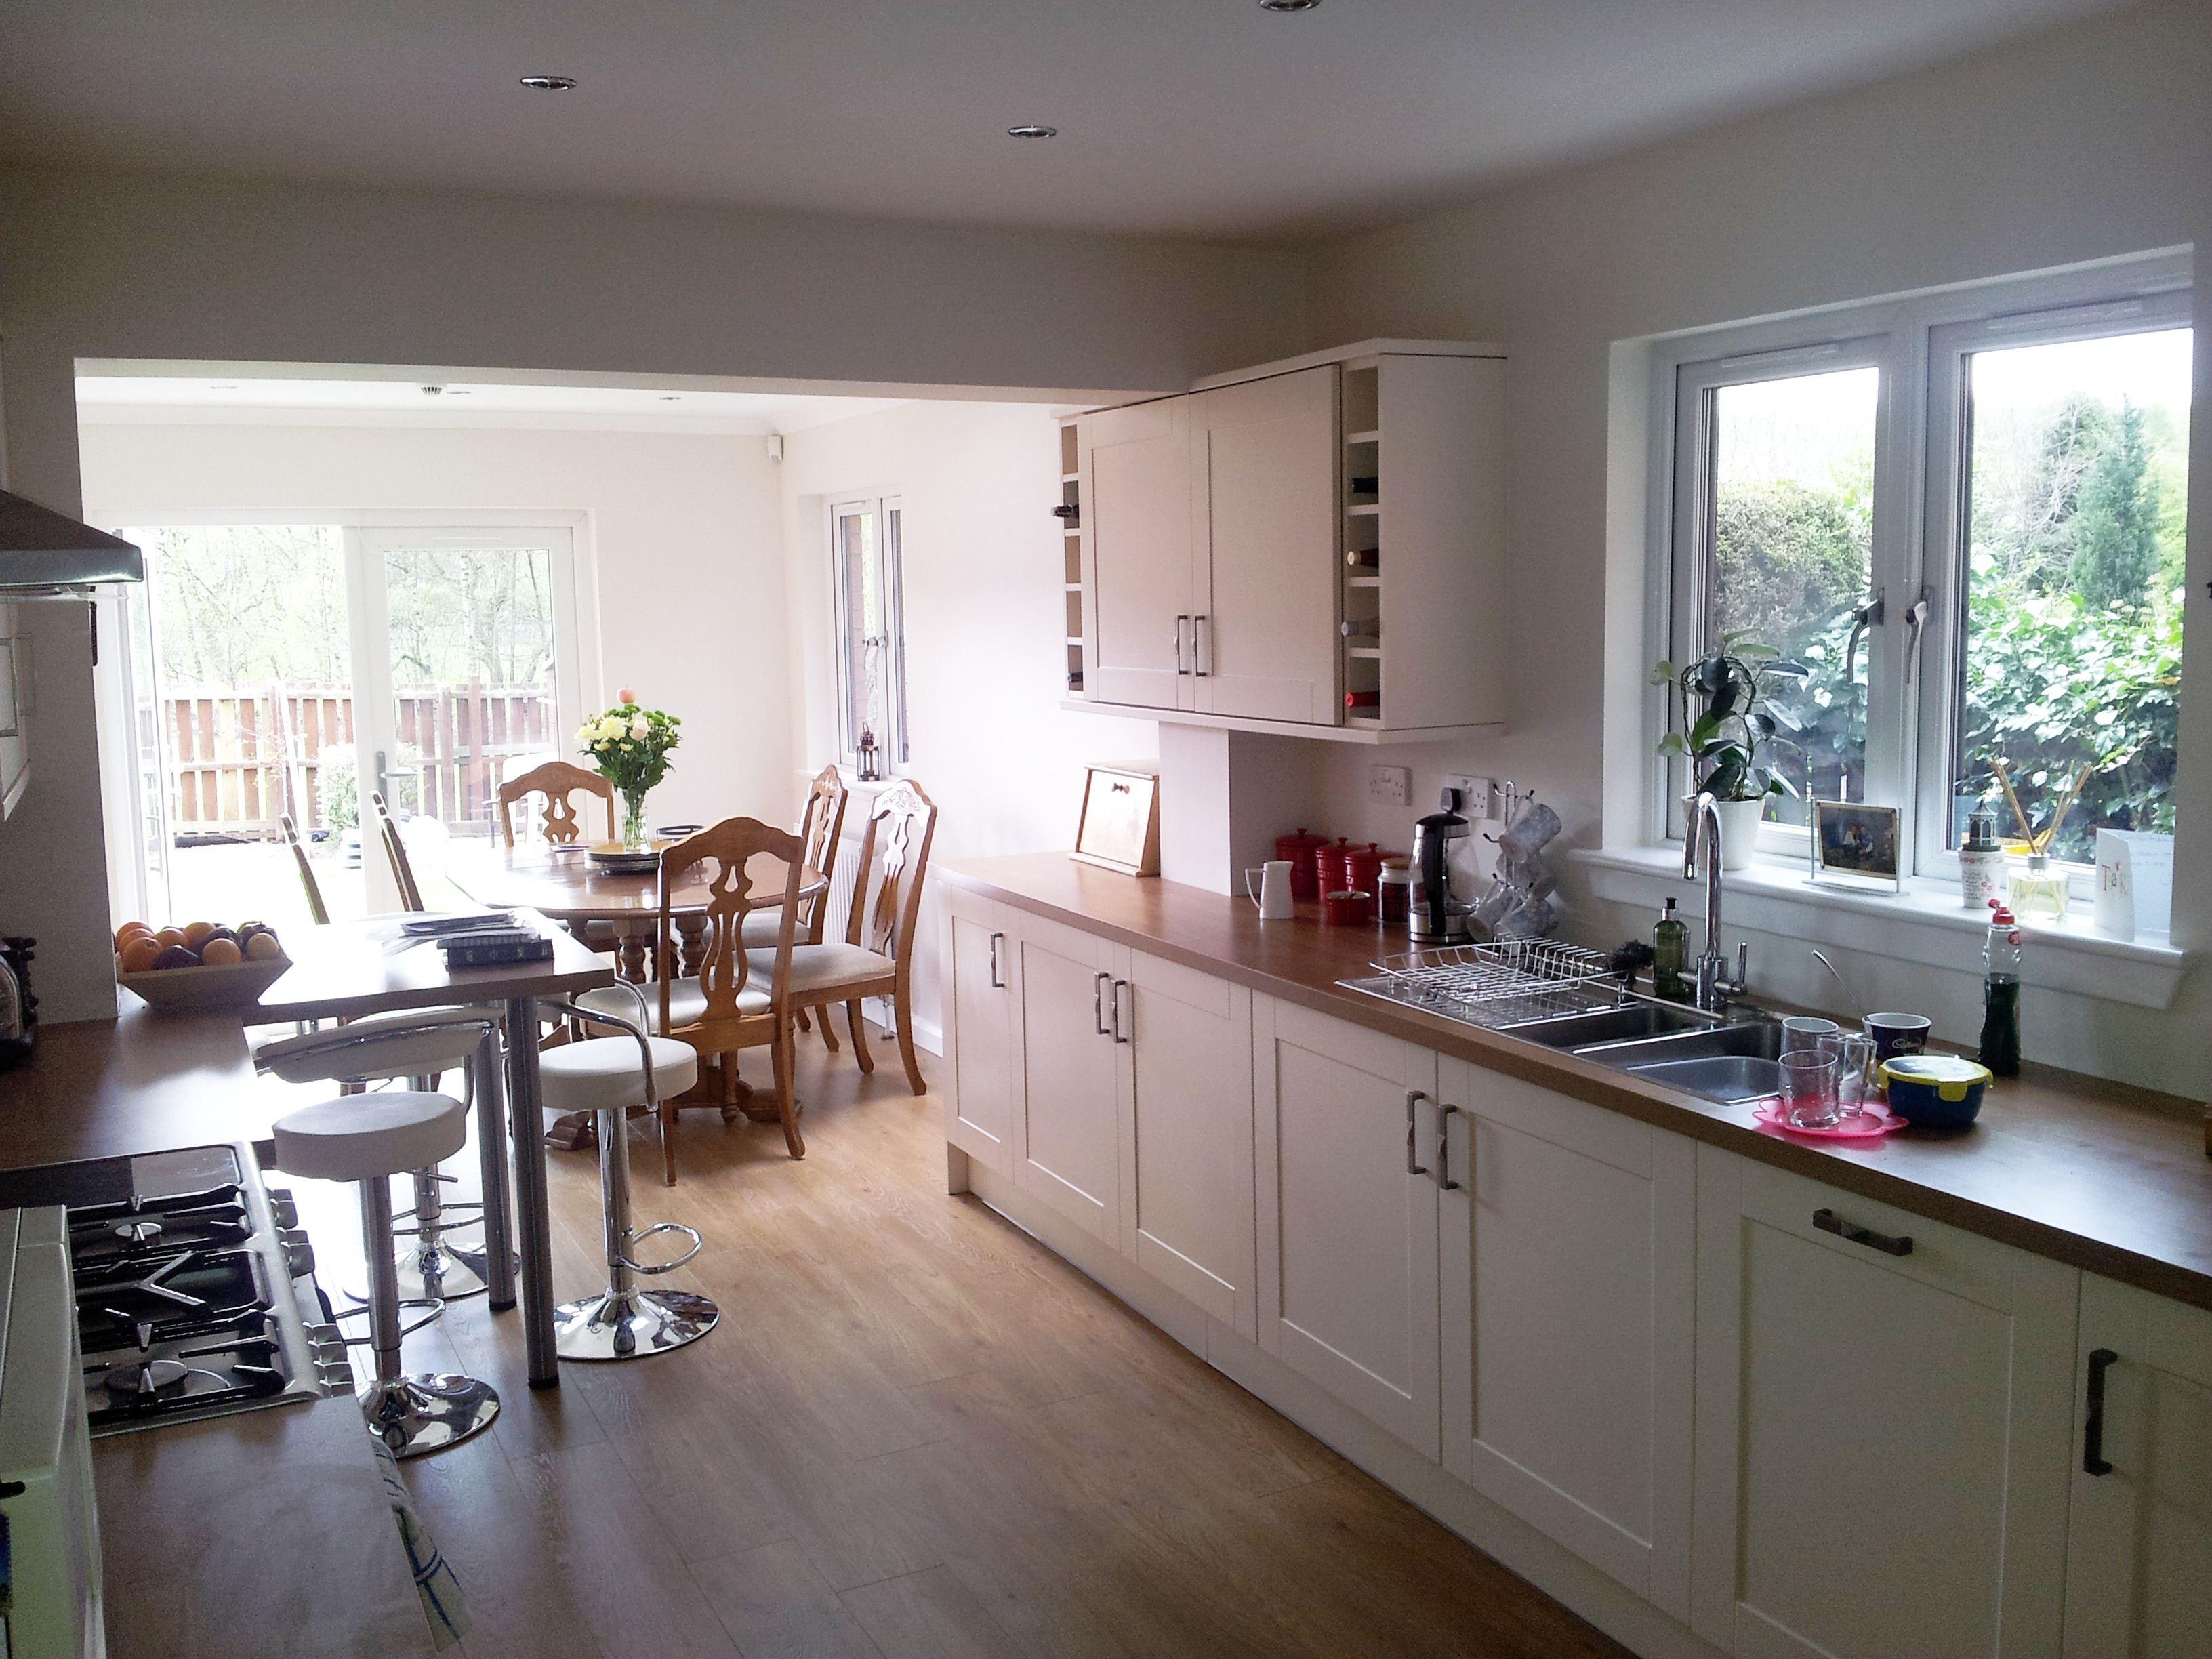 1930s Semi Kitchen Extension Ideas Google Search Like The